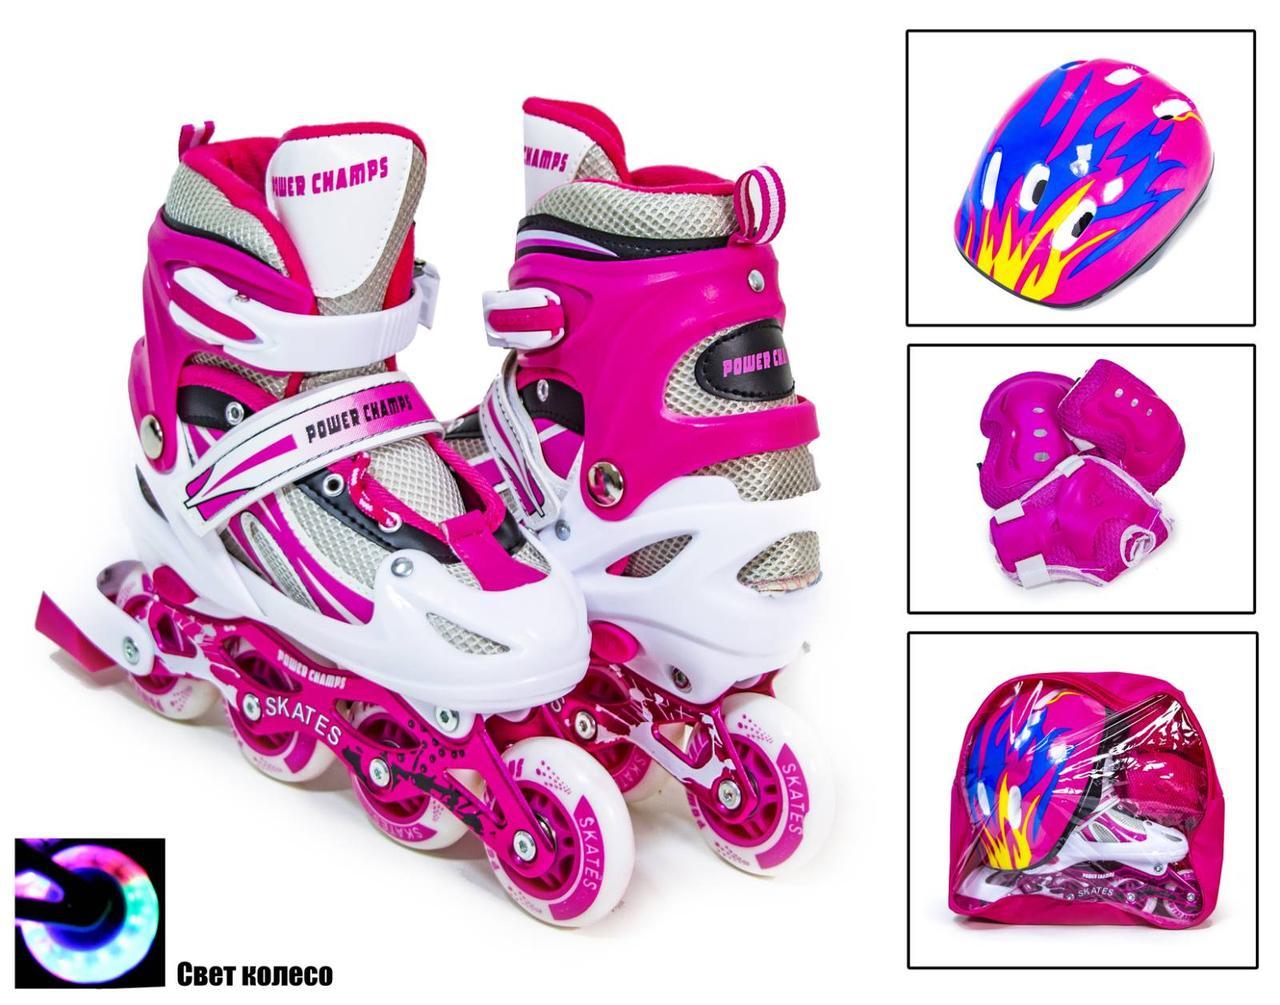 Комплект Power Champs Pink р 29-33